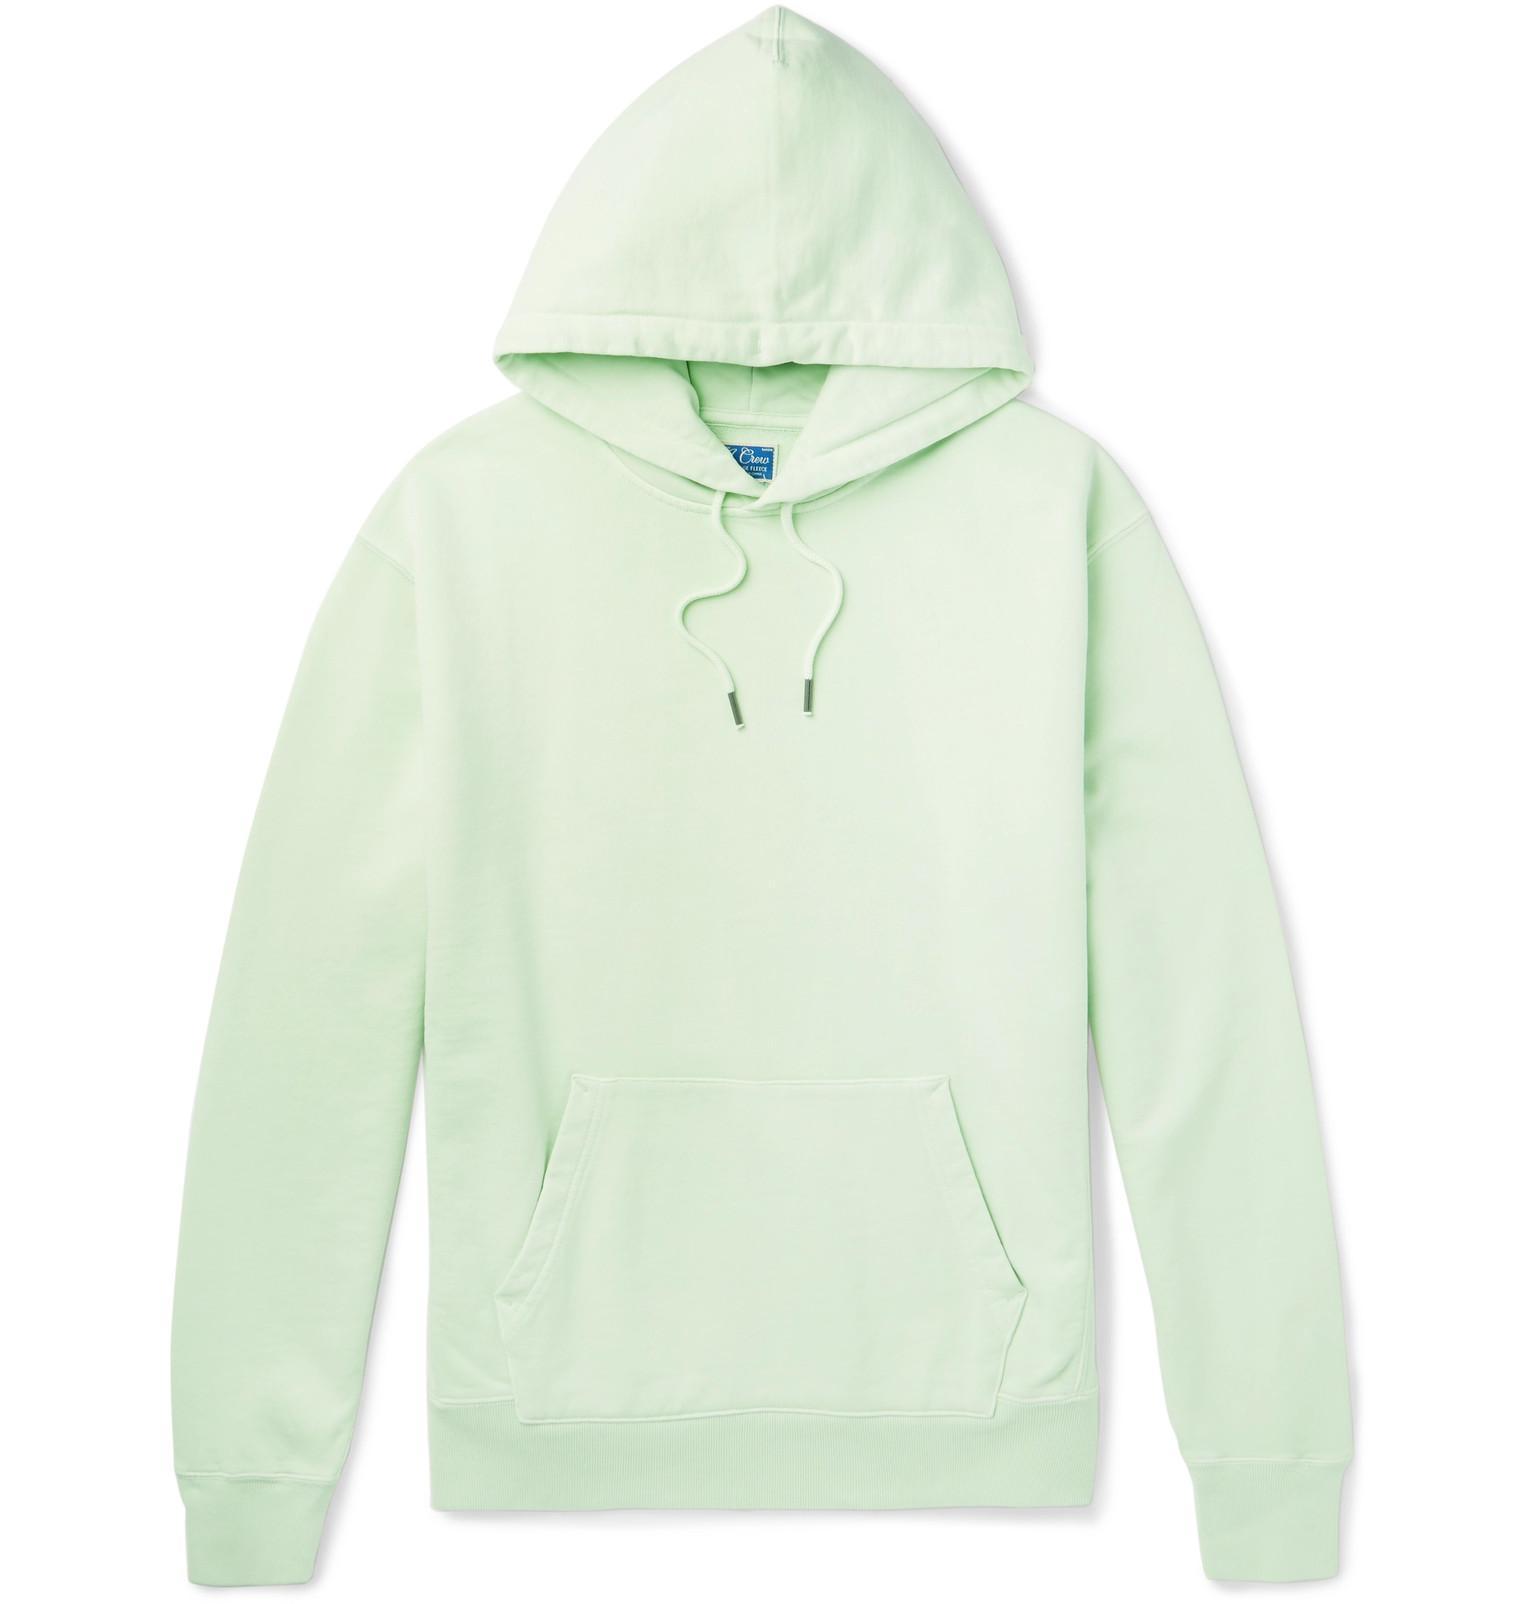 J.Crew Garment-dyed Loopback Cotton-jersey Hoodie - Green hNTeyX